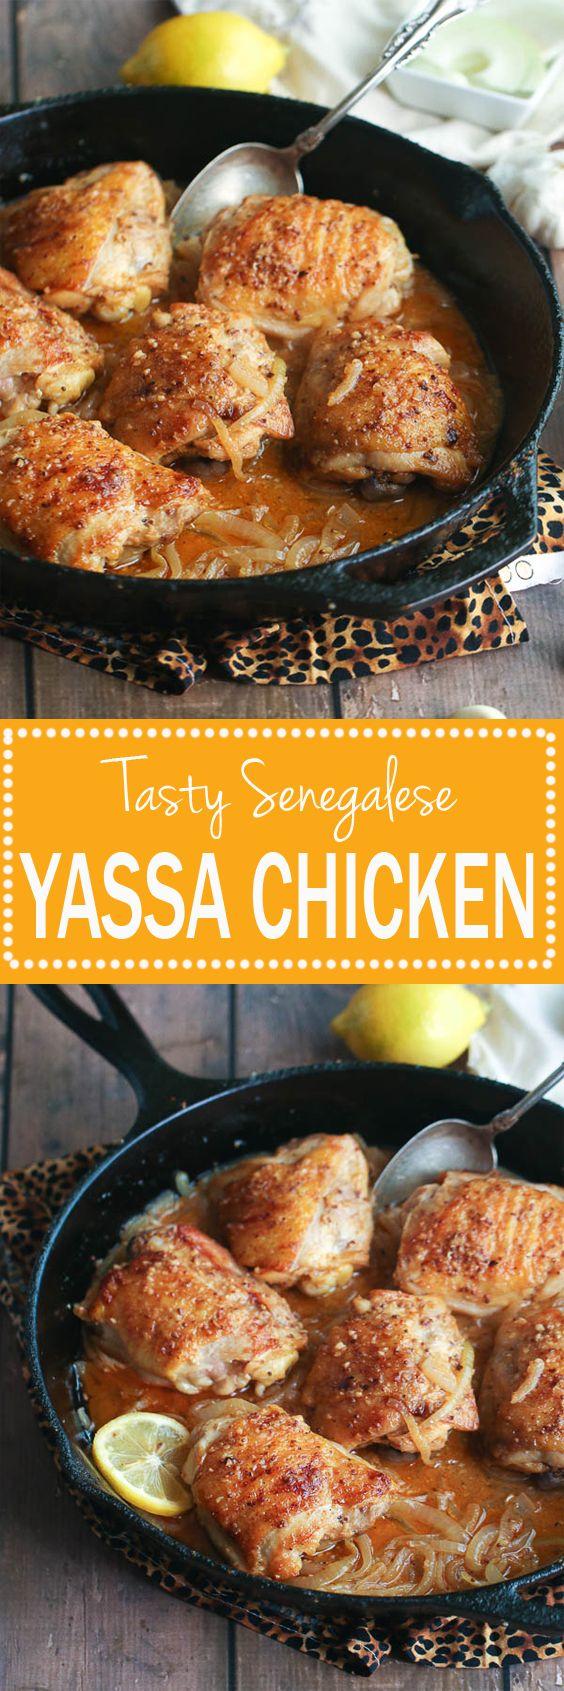 Yassa Chicken (Poulet au Yassa)- Popular Grilled  Senegalese chicken simmered in garlic and onions sauce